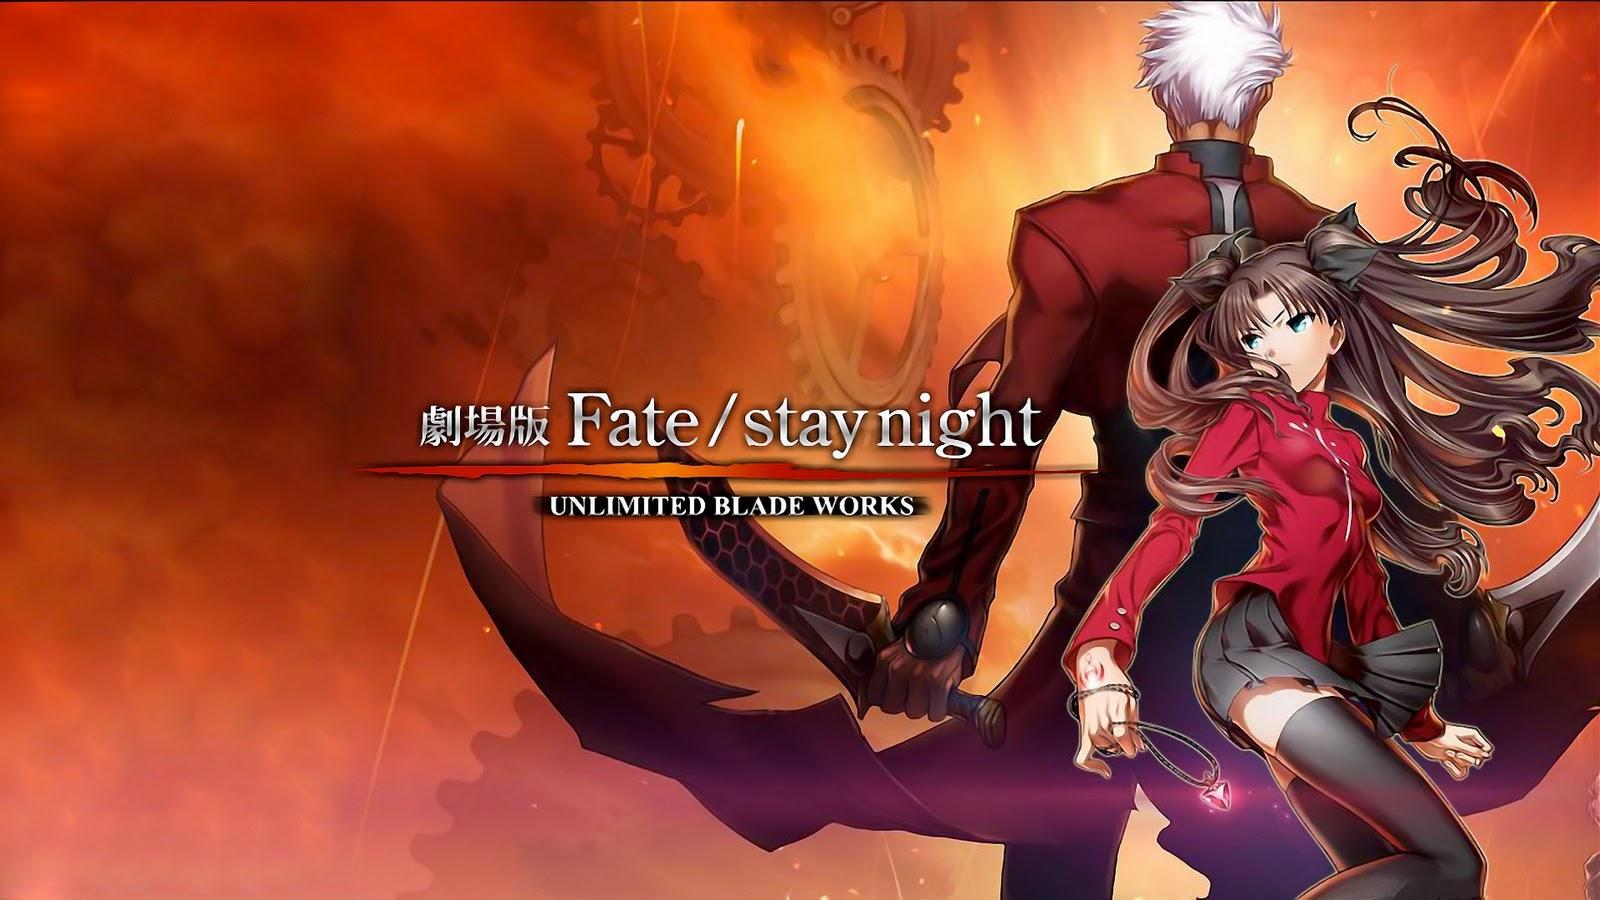 FateStay Night Unlimited Blade Works BD Subtitle Indonesia English 1600x900